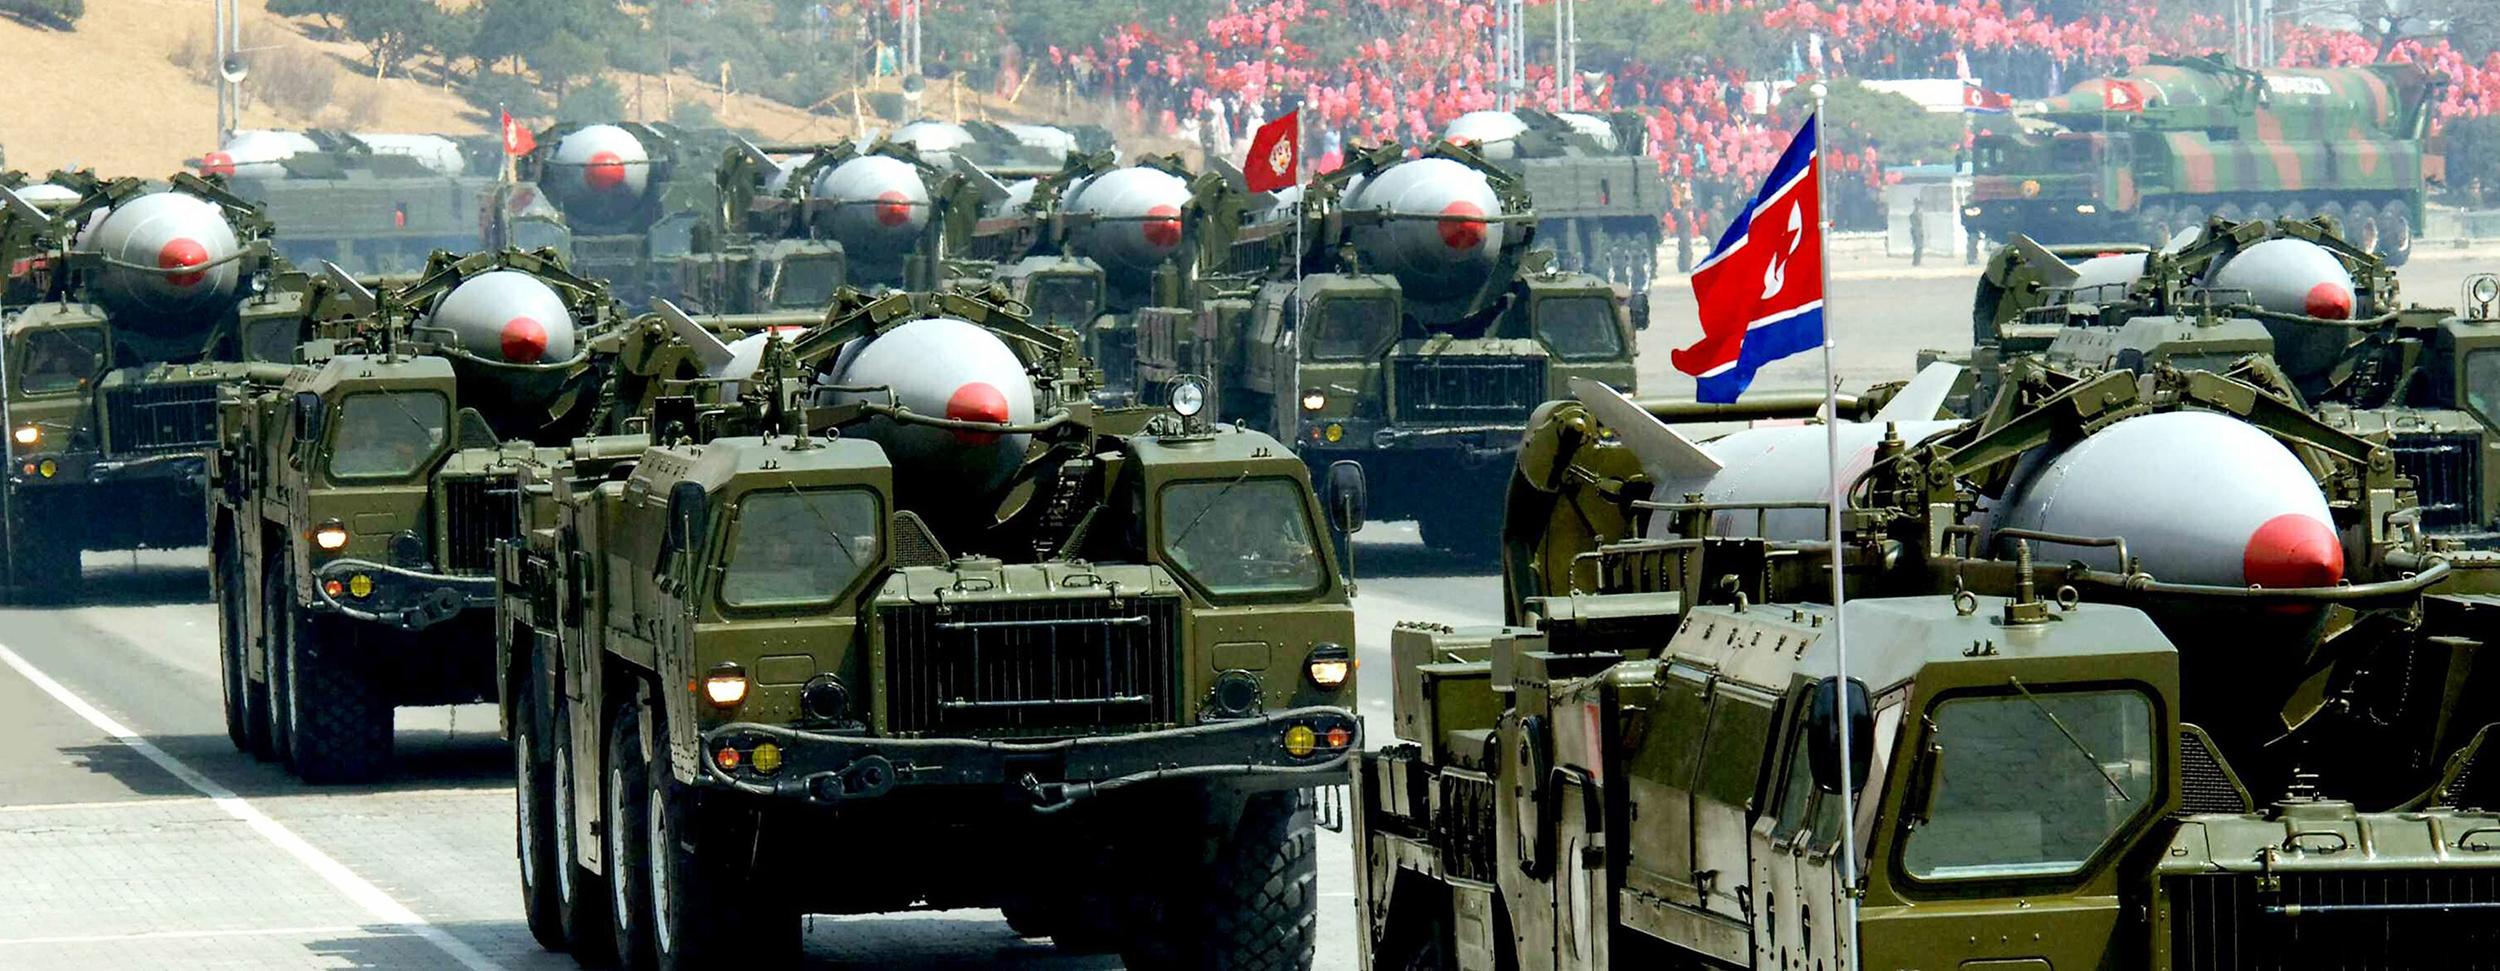 China Warns U.S. of North Korea's Rising Nuclear Capabilities: Report